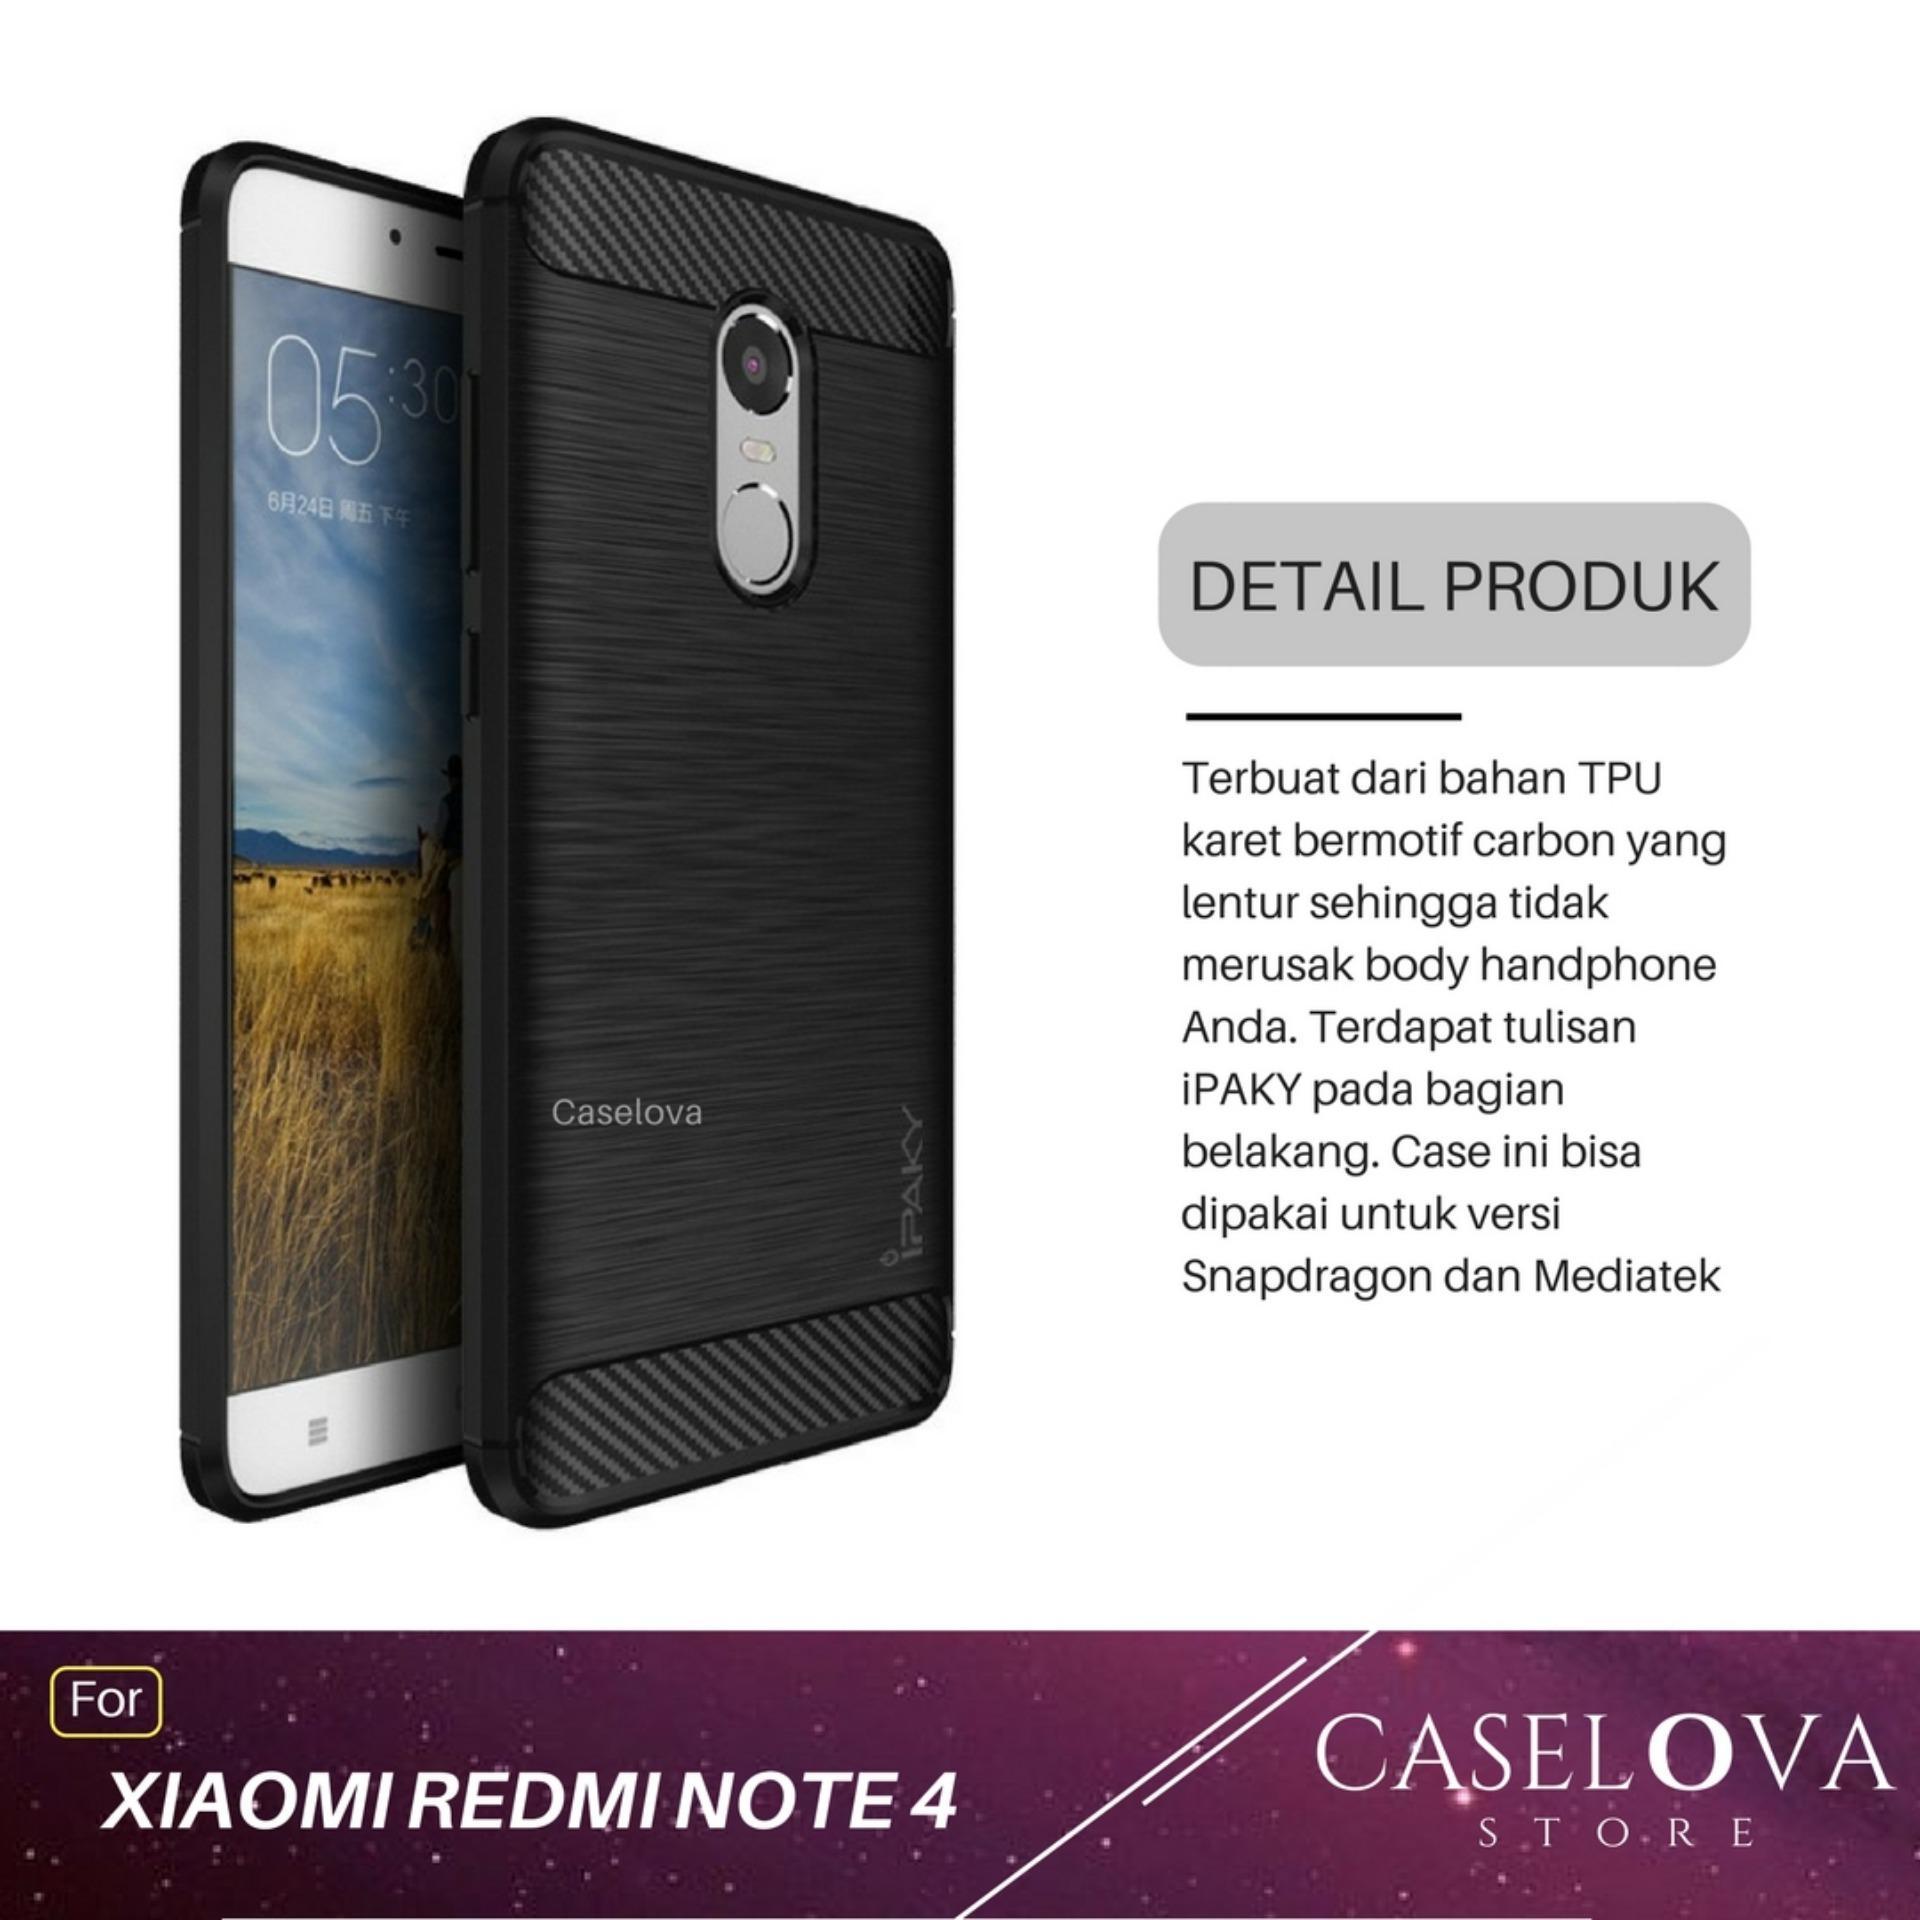 Peonia Premium Carbon Shockproof Hybrid Case For Xiaomi Redmi Note Transparent Acrylic 4x Snapdragon Tg Merah Note4x 4 Versi Source Shock Price Caselova